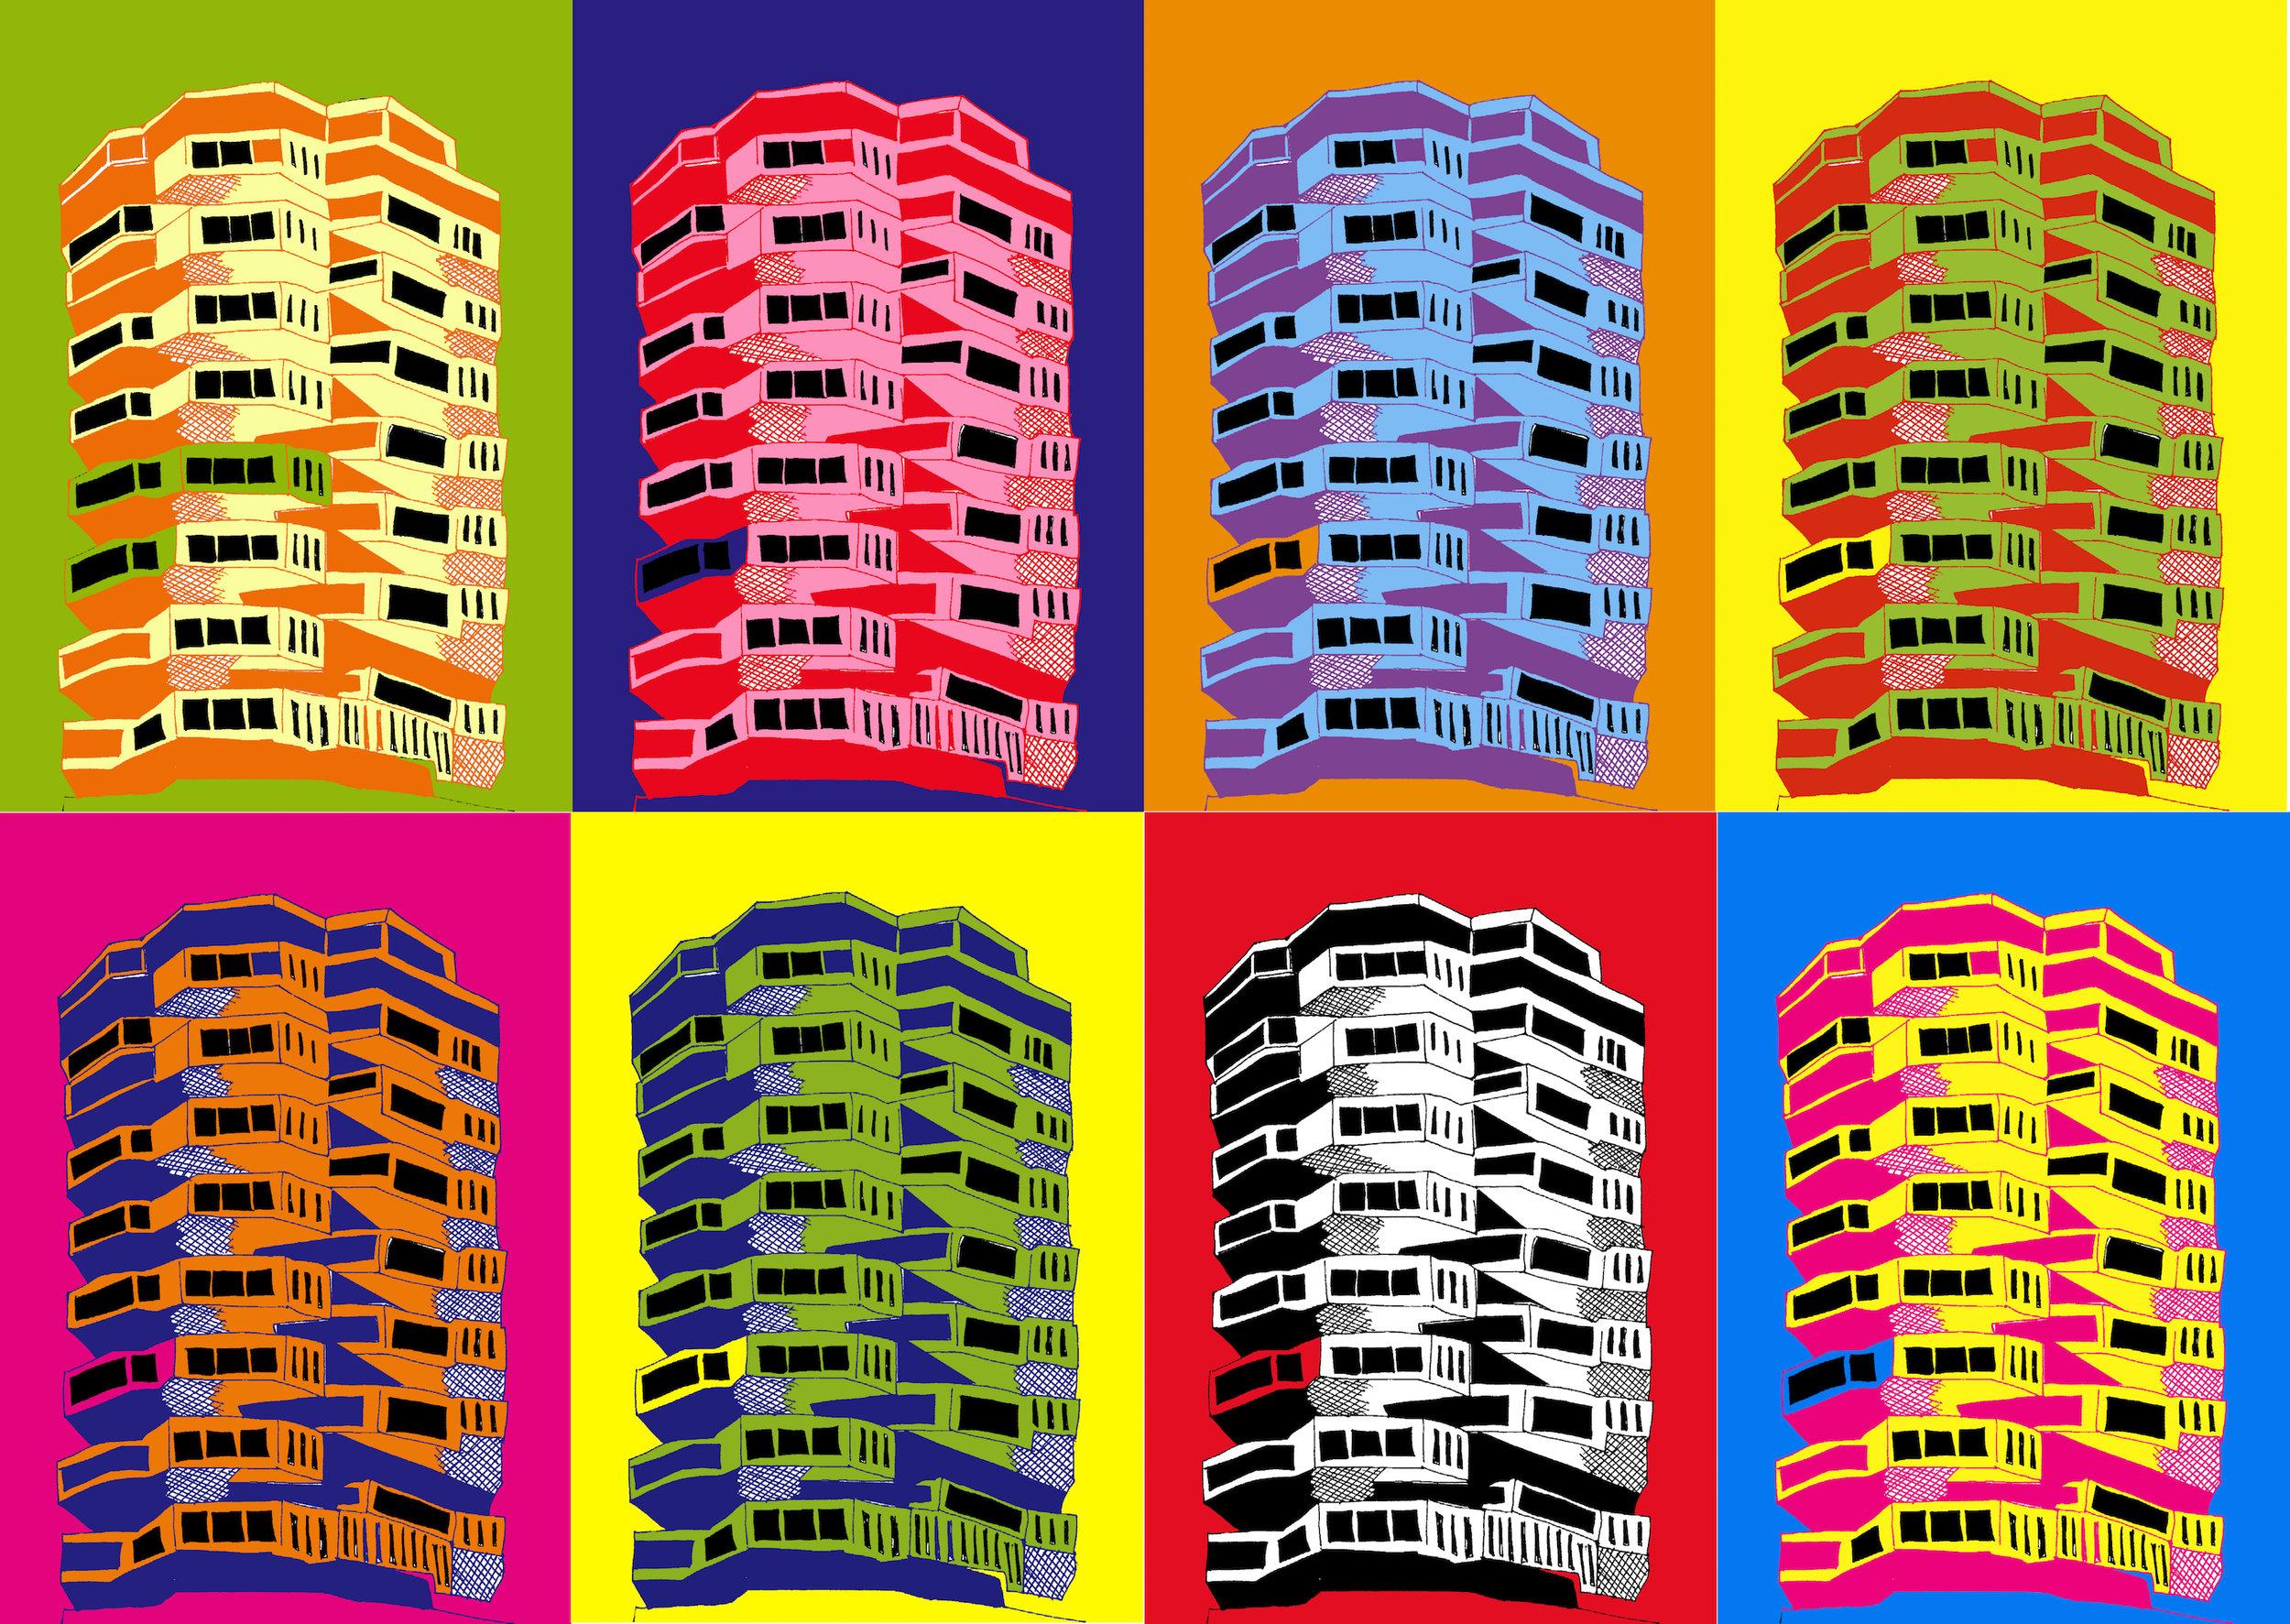 No 1 Croydon Warhol Repeat Small.jpg